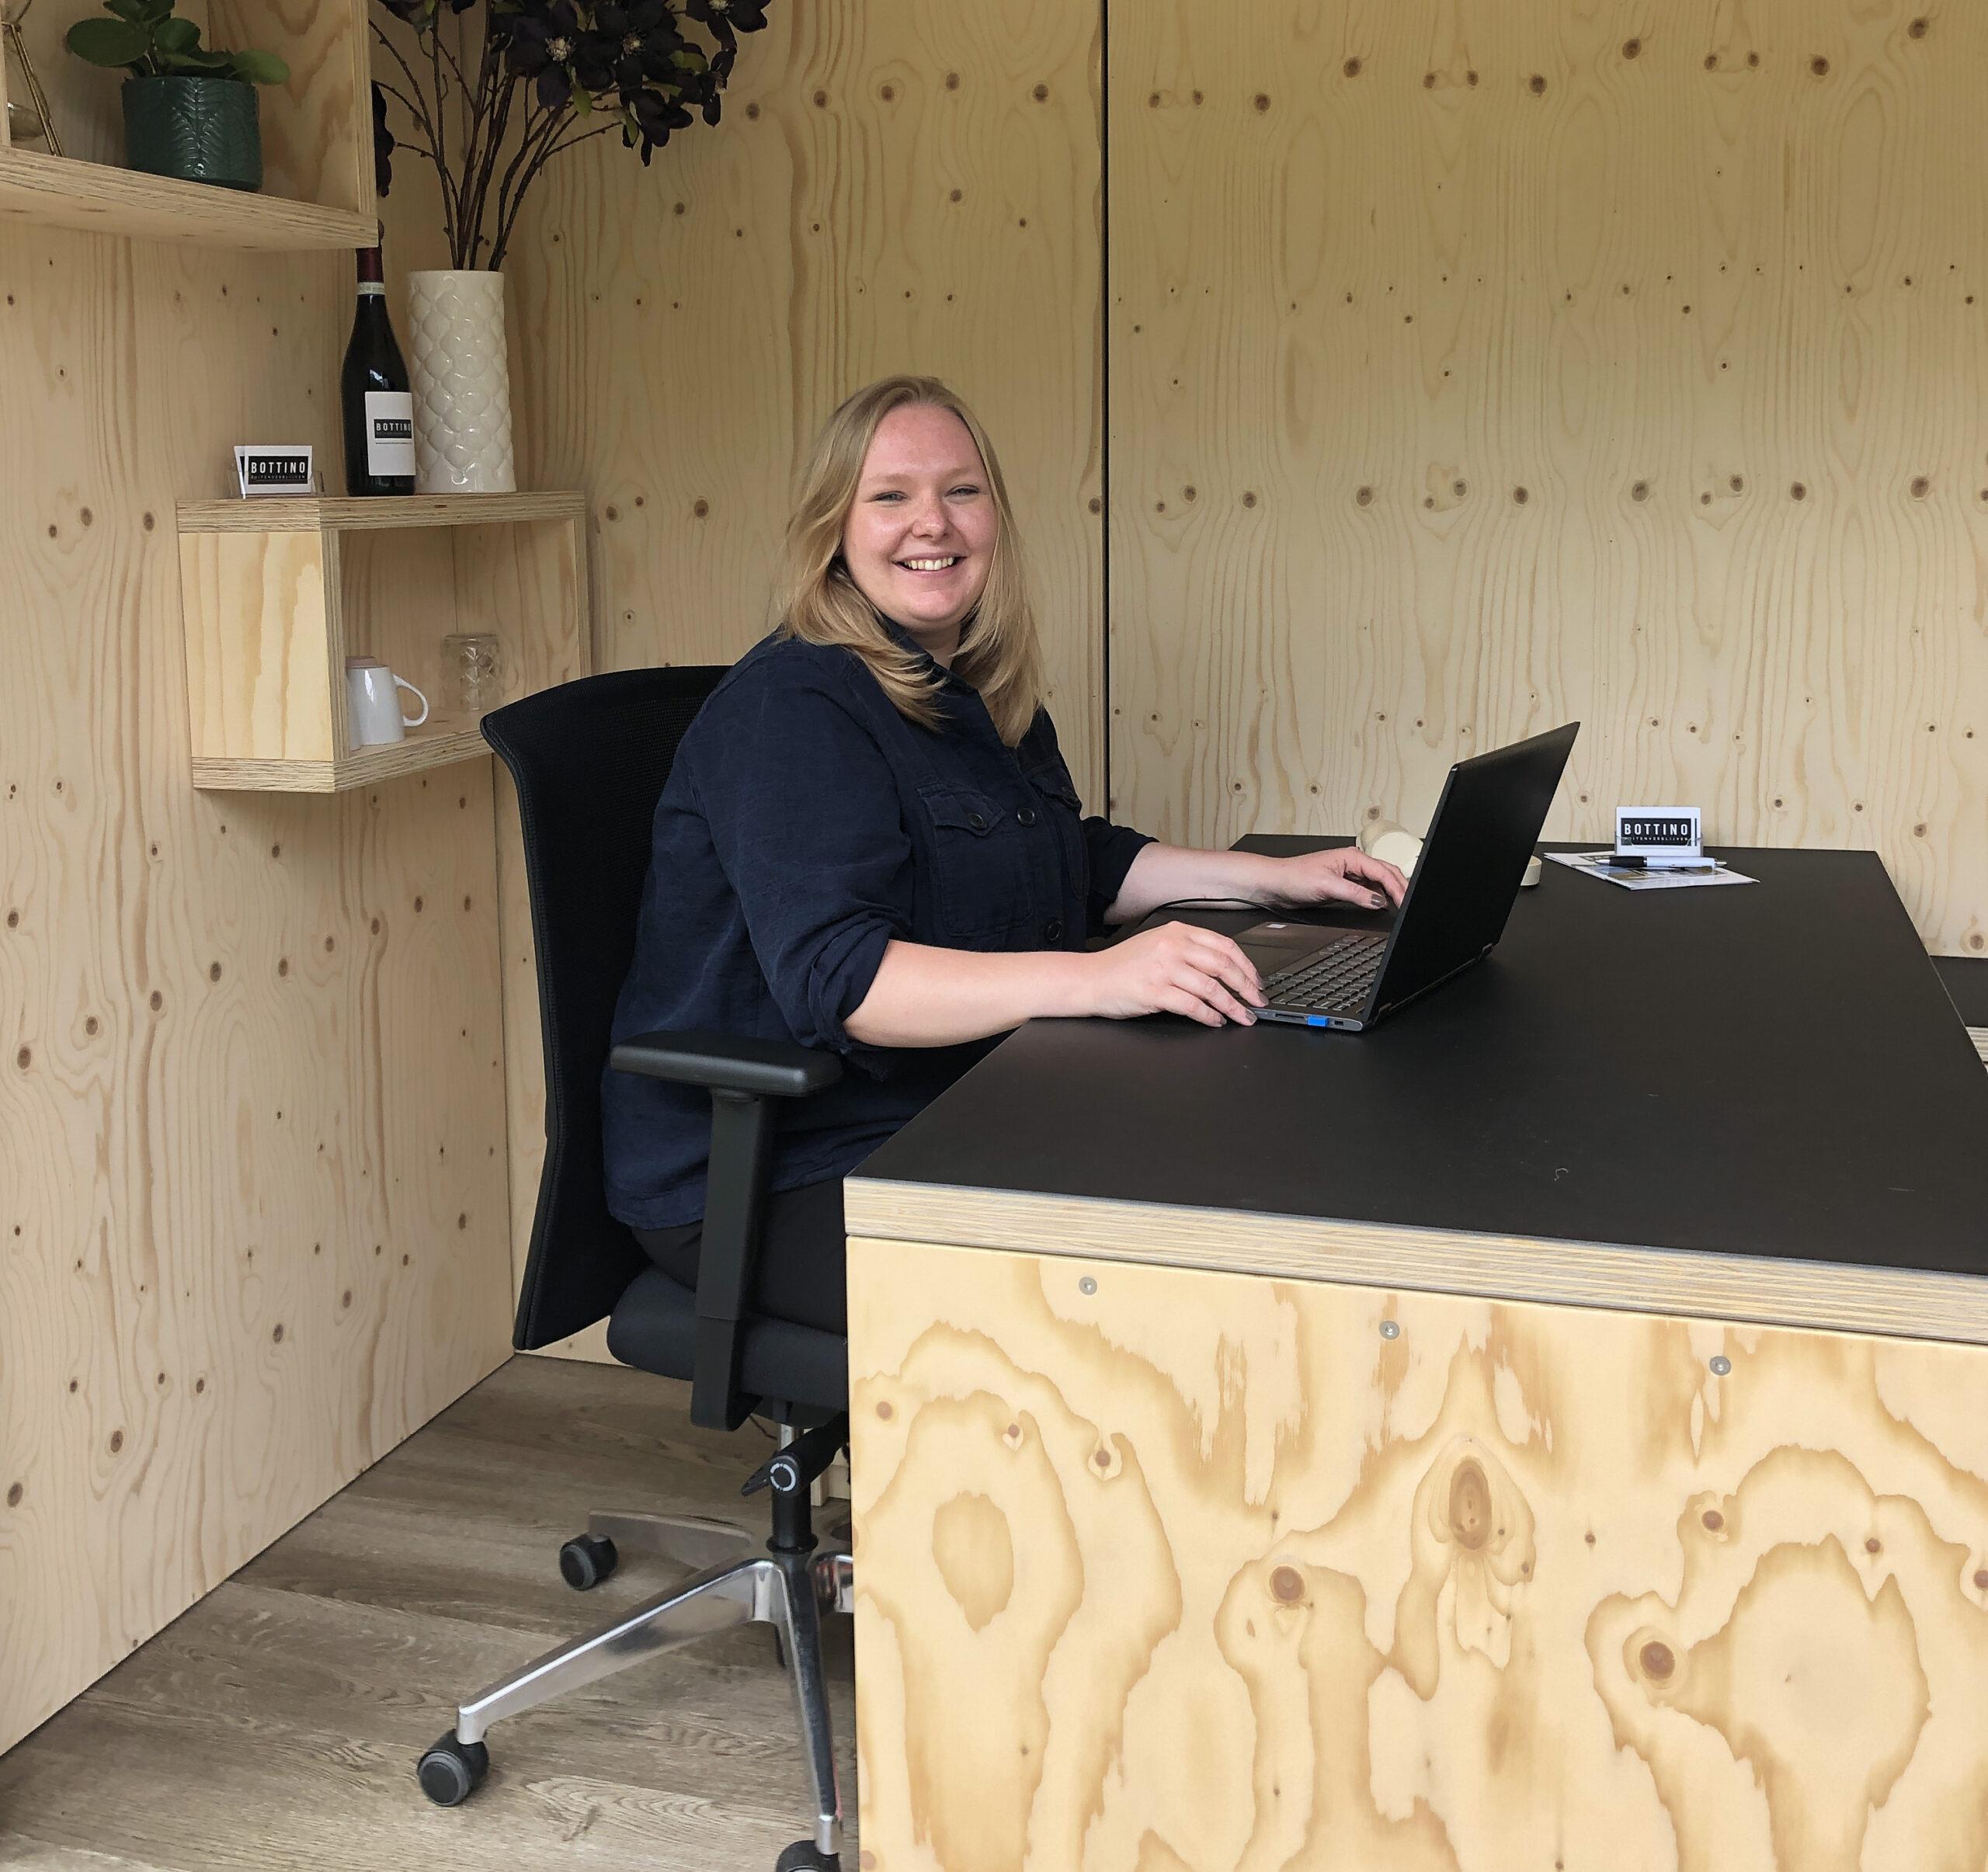 Jody Peters | Social Media Manager